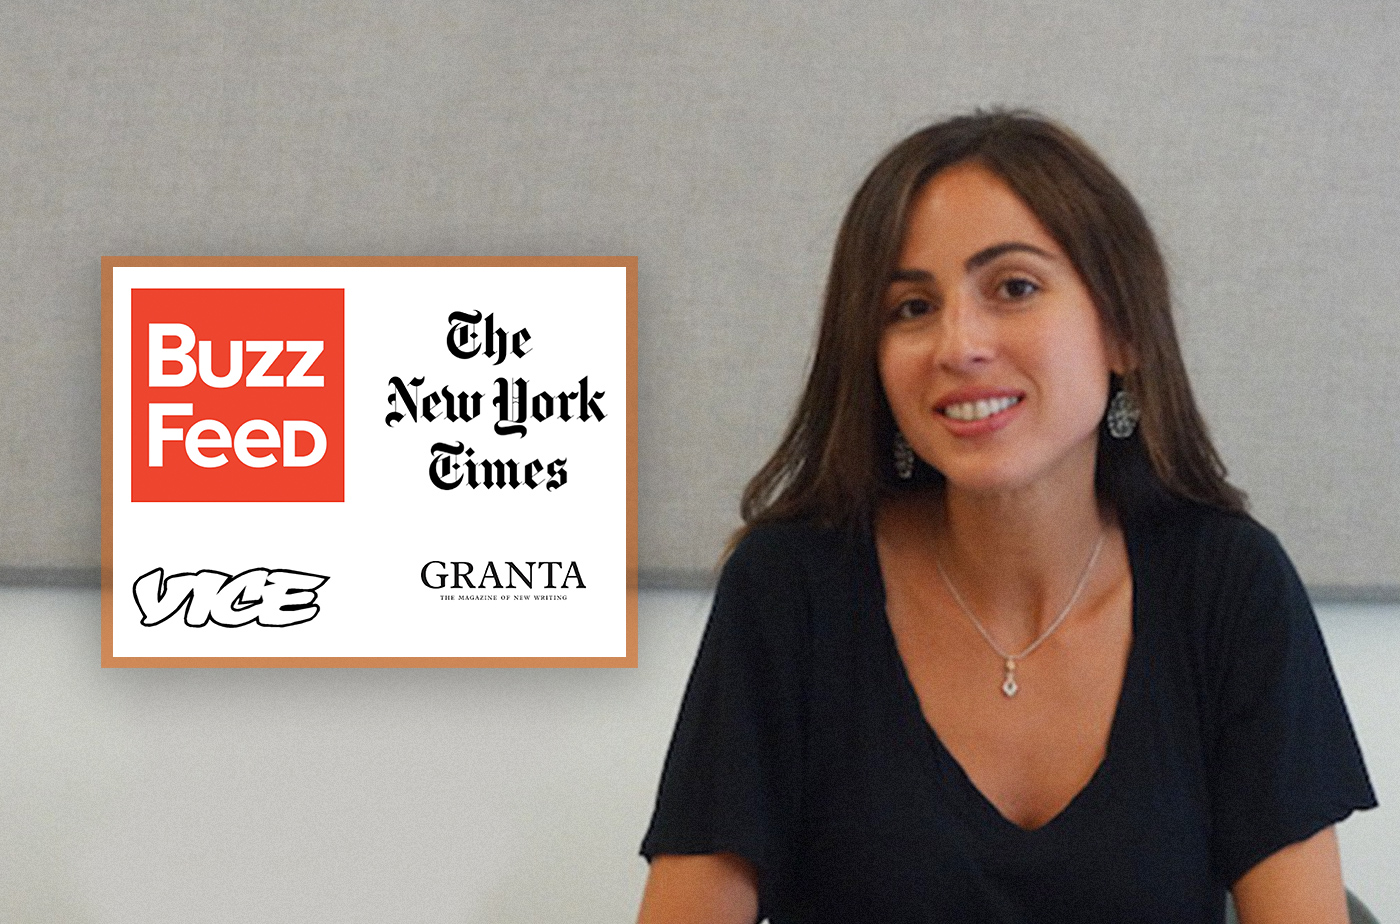 Catapult  classes: Zaina Arafat, 6-Week Nonfiction Workshop: Crafting the Personal Essay, Nonfiction, Workshop